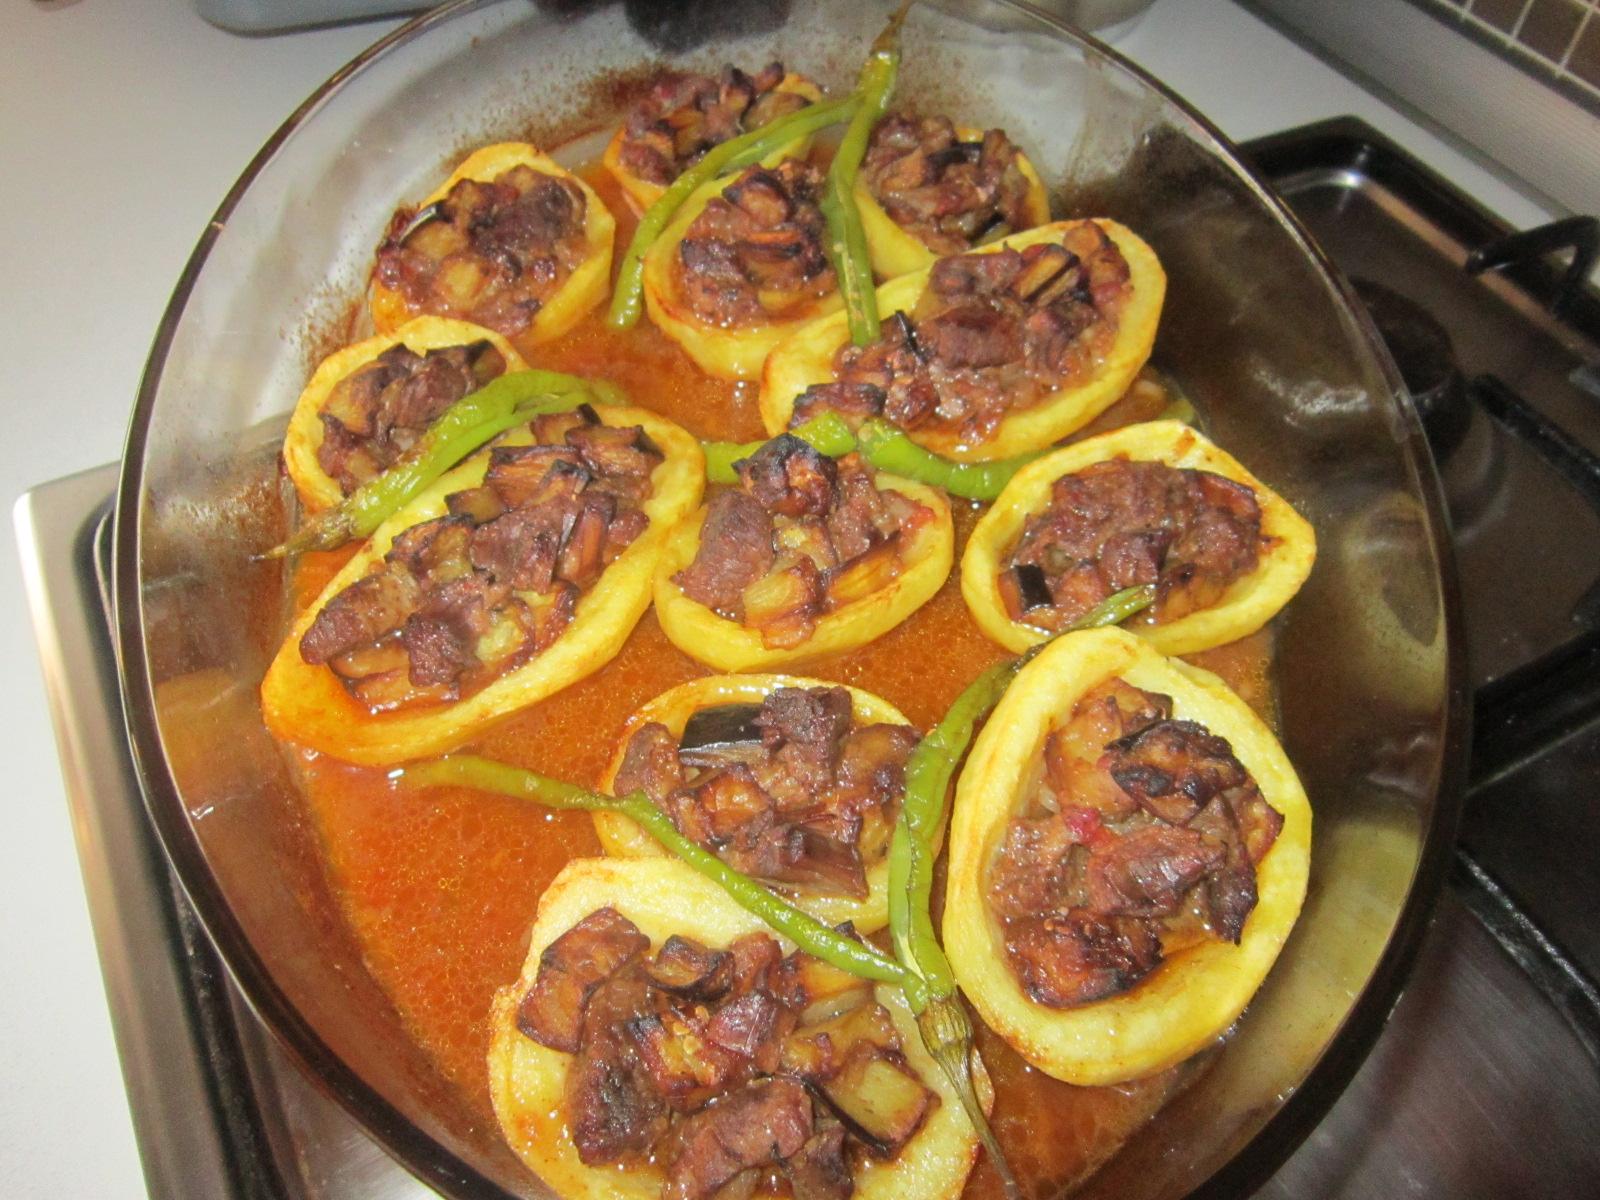 Patates Yatağinda Köfte Tarifi